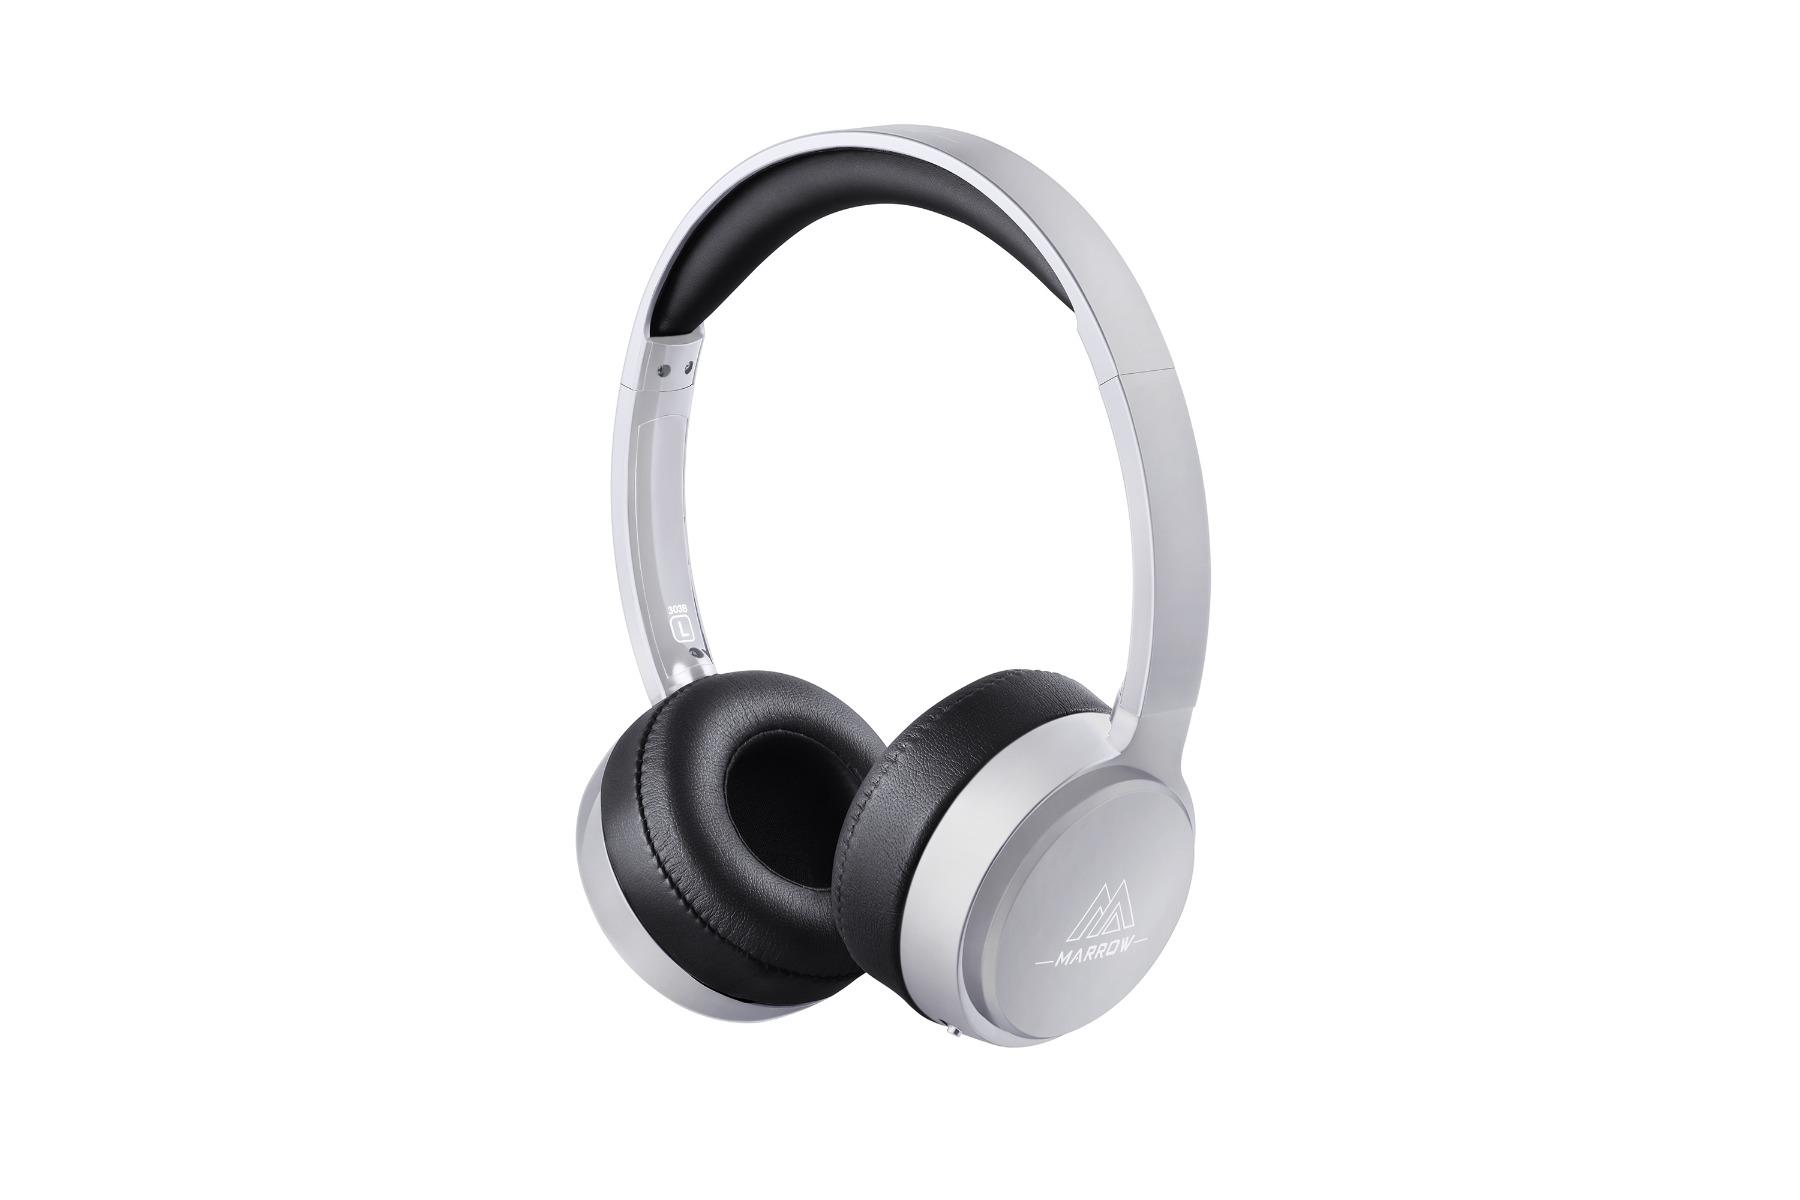 MARROW 303B Wireless Bluetooth Headphones with Mic Headband